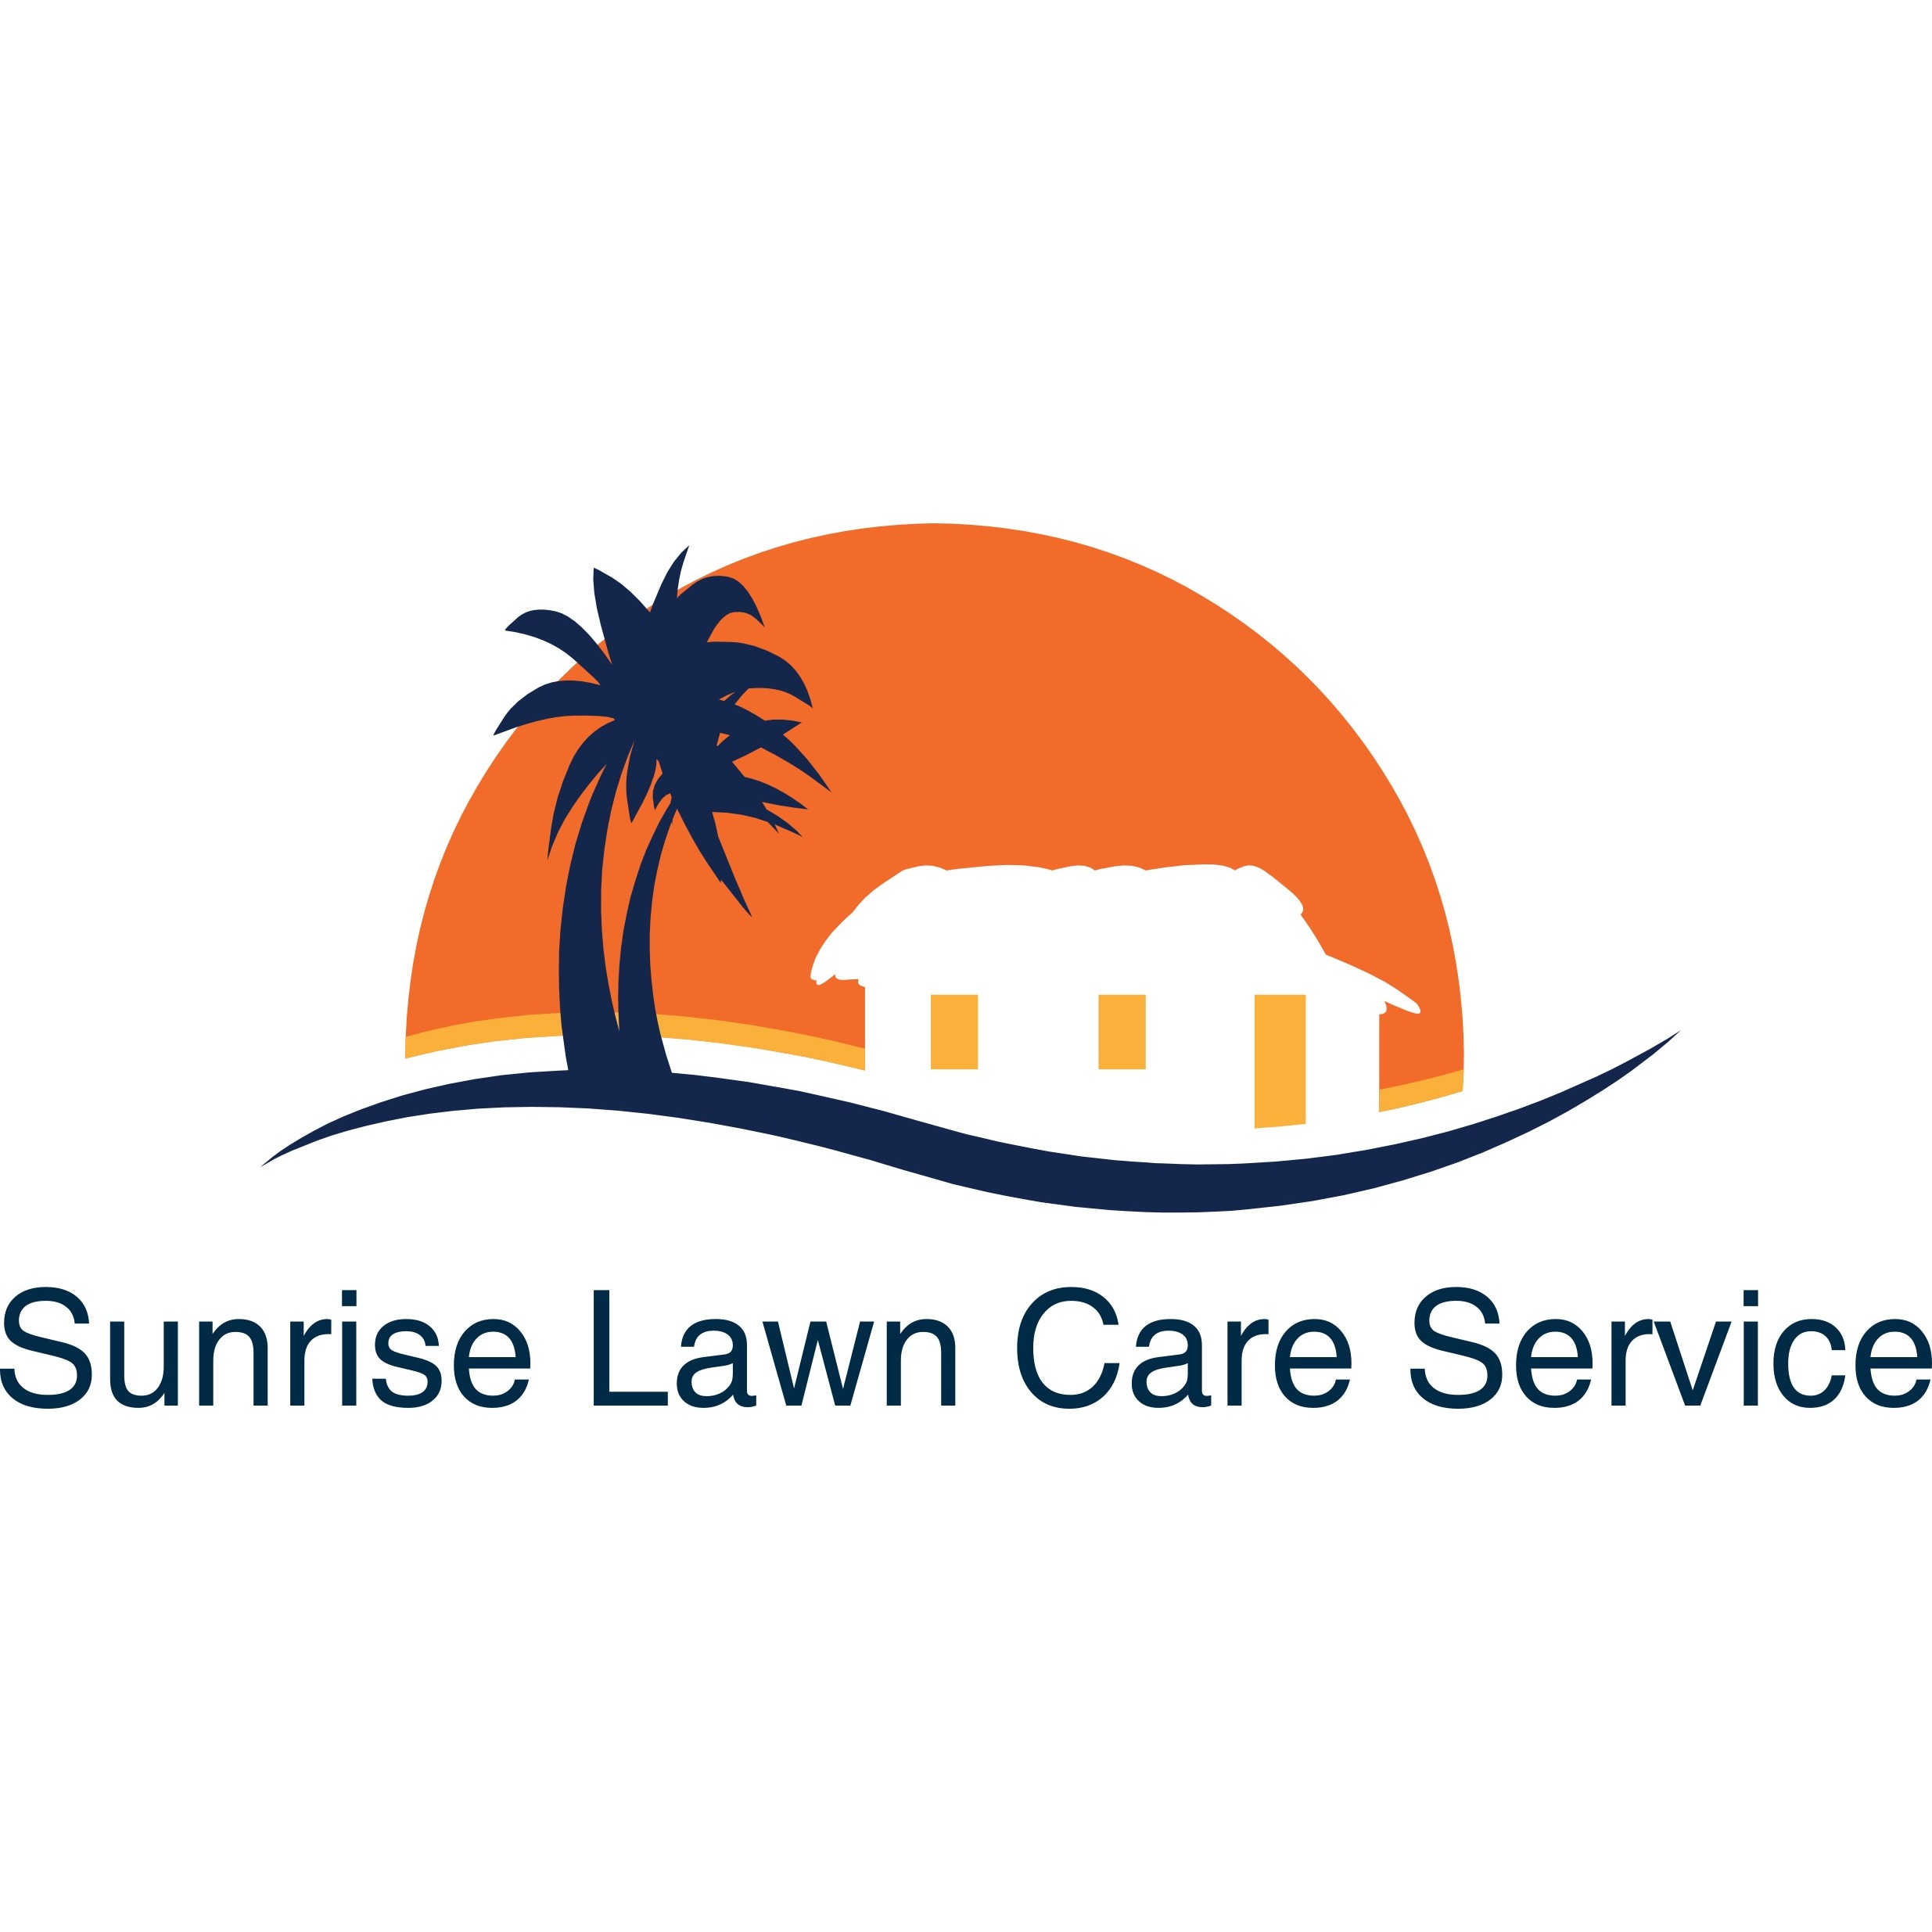 Sunrise lawn care service inc in lehigh acres fl 33974 for Lawn treatment service